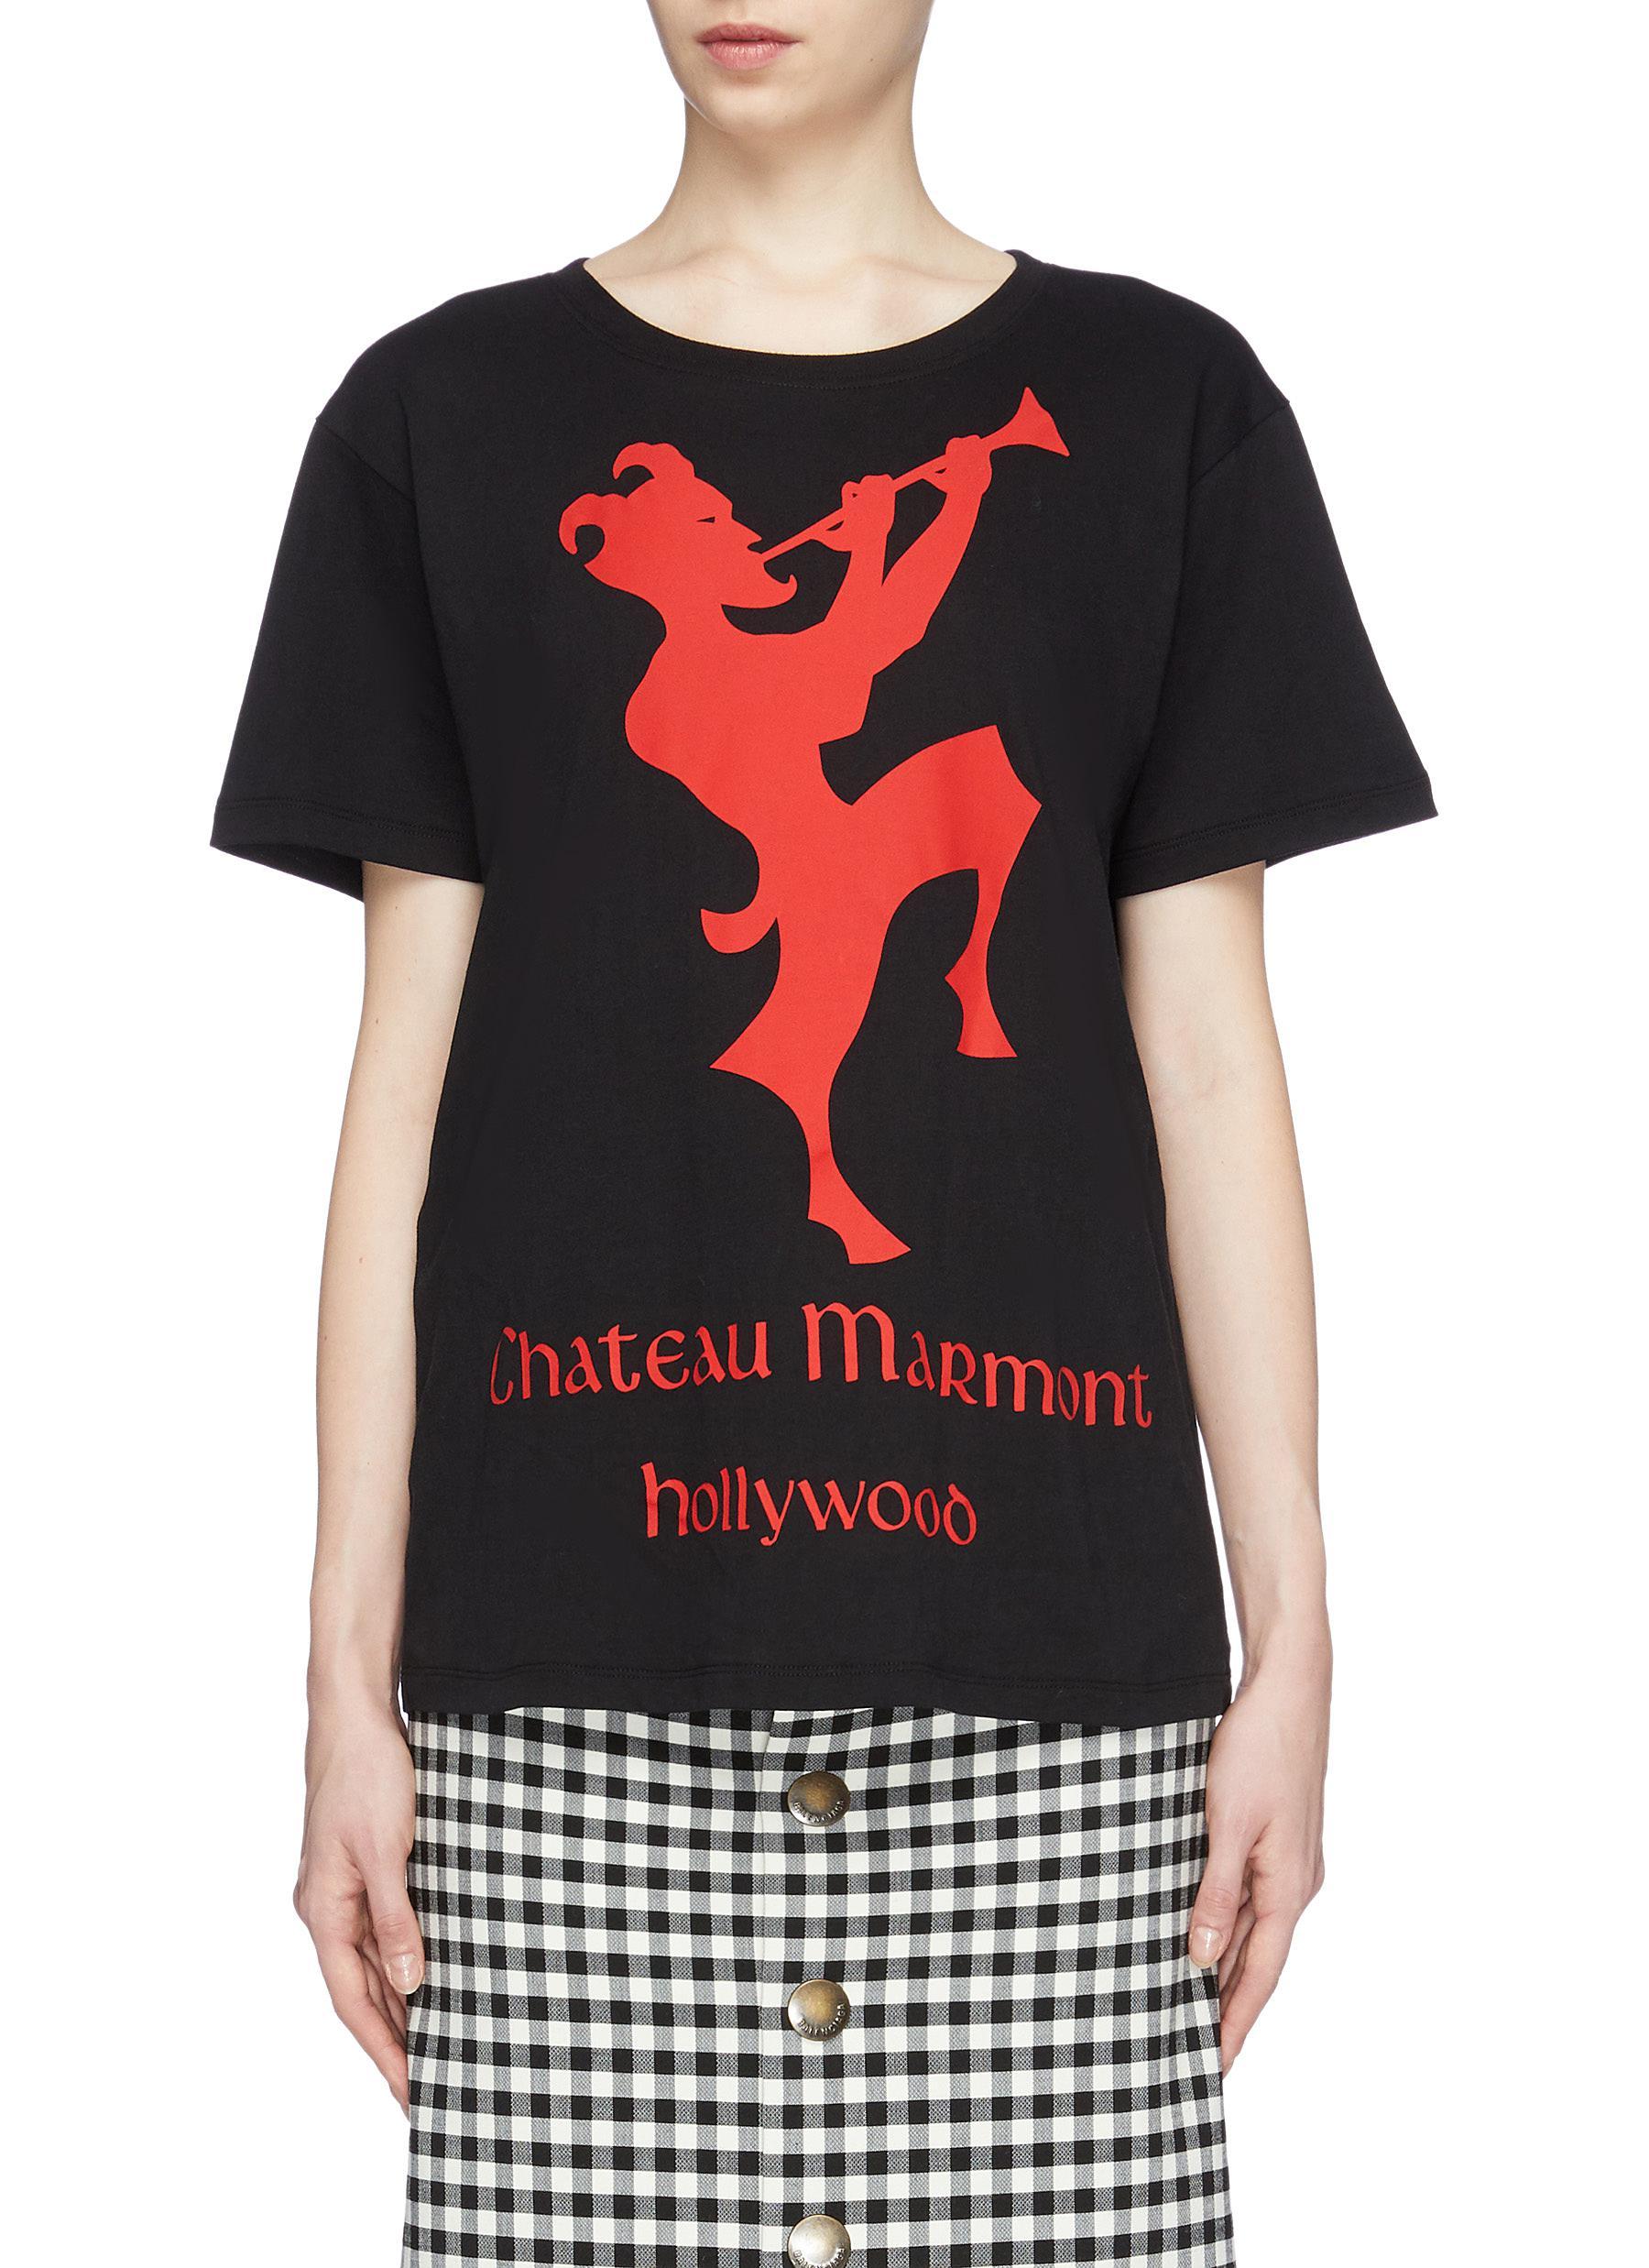 6295d1a1512bac Gucci   'Chateau Marmont' graphic print T-shirt   Women   Lane Crawford